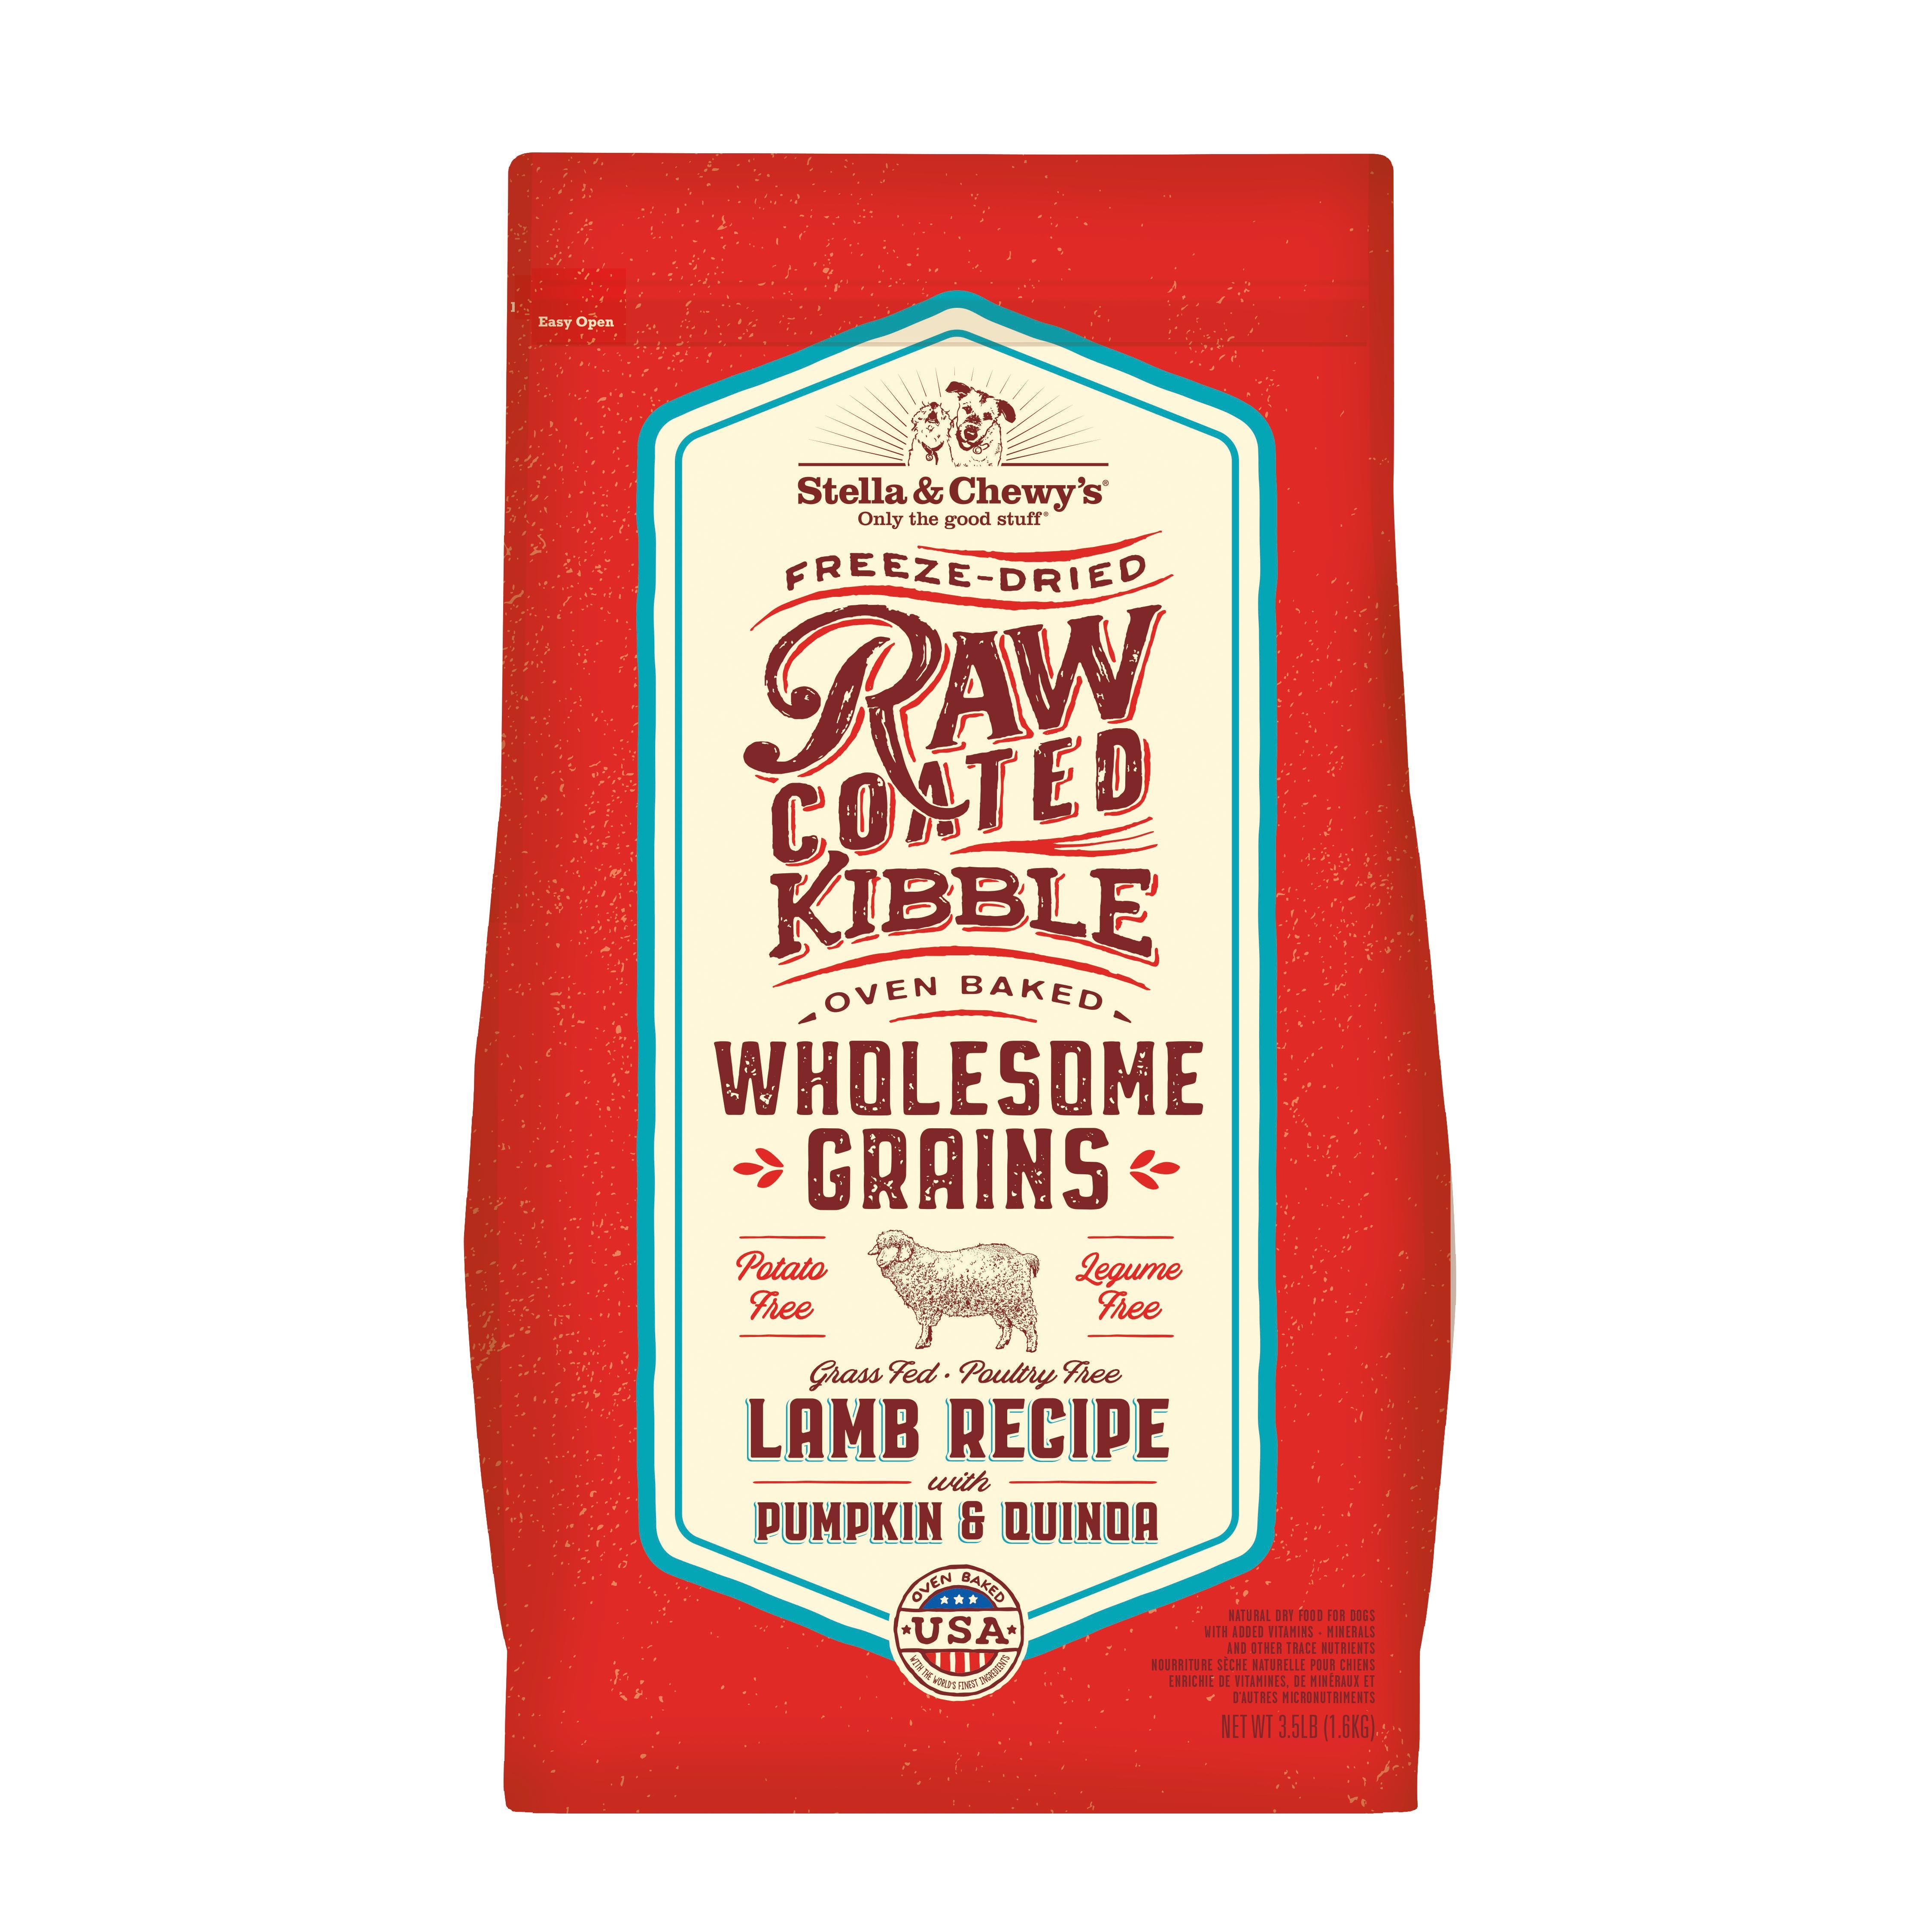 Stella & Chewy's Raw Coated Kibble Wholesome Grains Lamb, Pumpkin & Quinoa Dry Dog Food, 22-lb